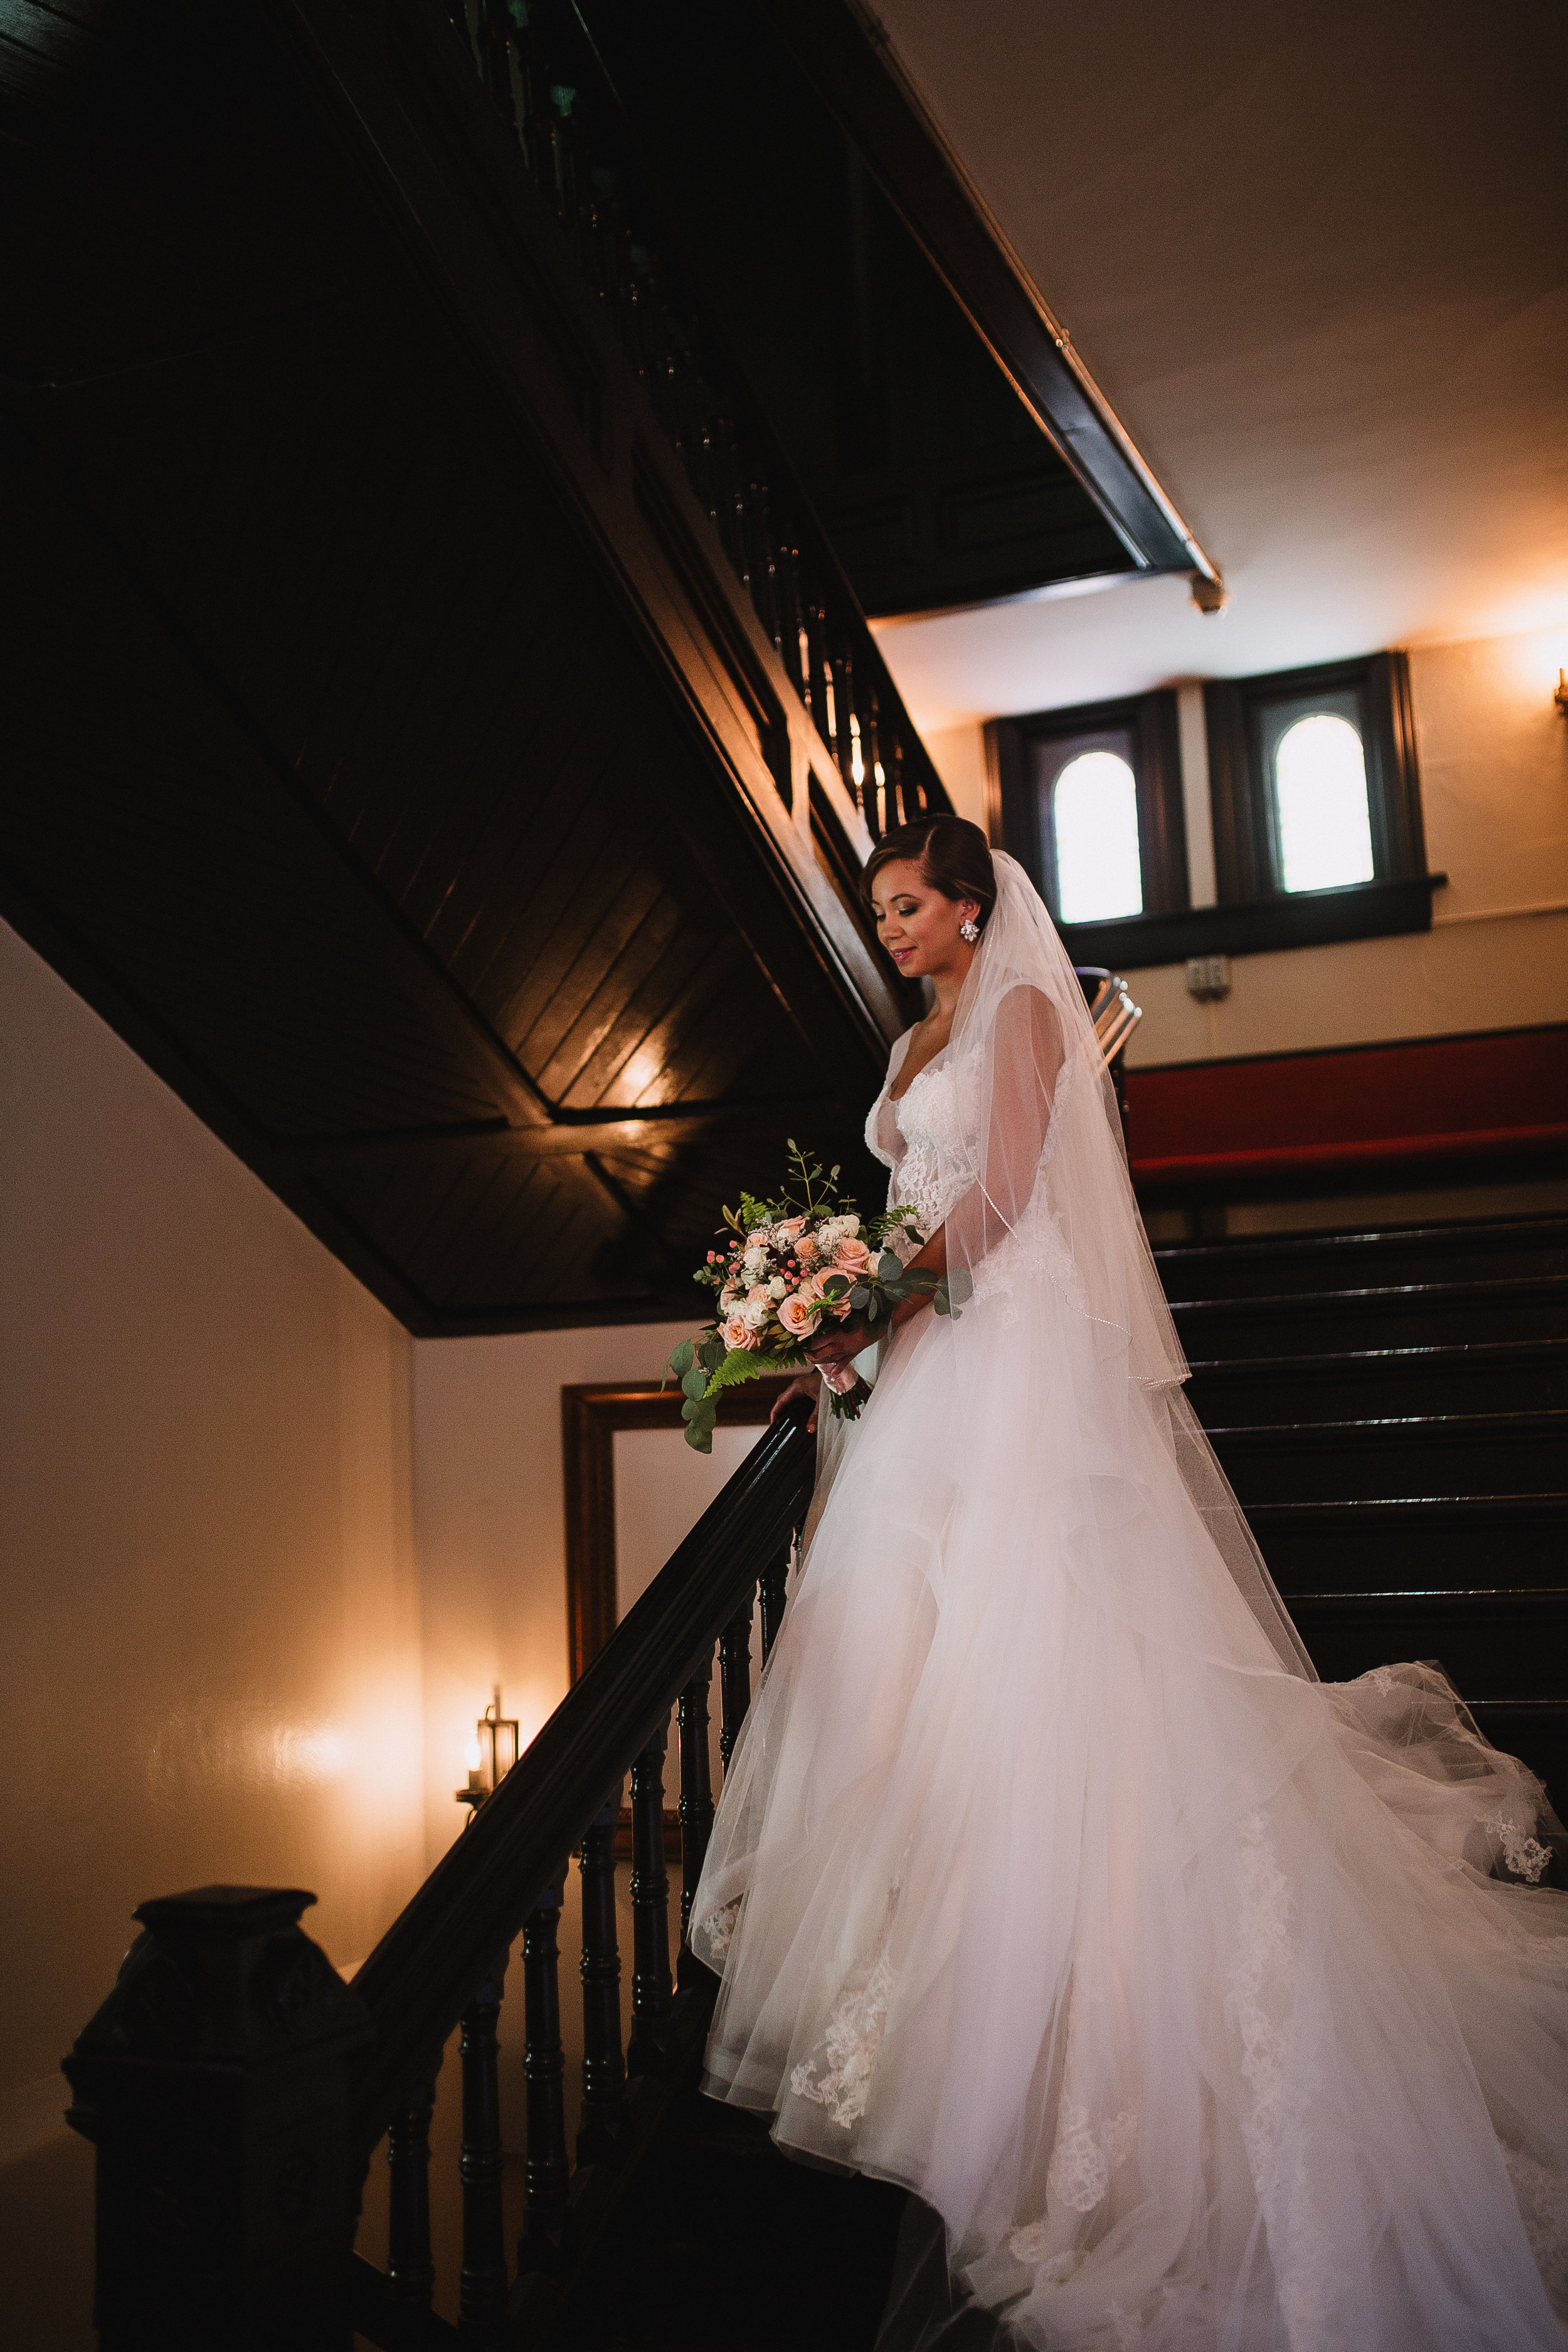 TRADITIONAL-WEDDING-PATTERNMAGAZINE-REAGANLYNNPHOTOGRAPHY-INDIANAPOLIS-INDIANA-3.jpg